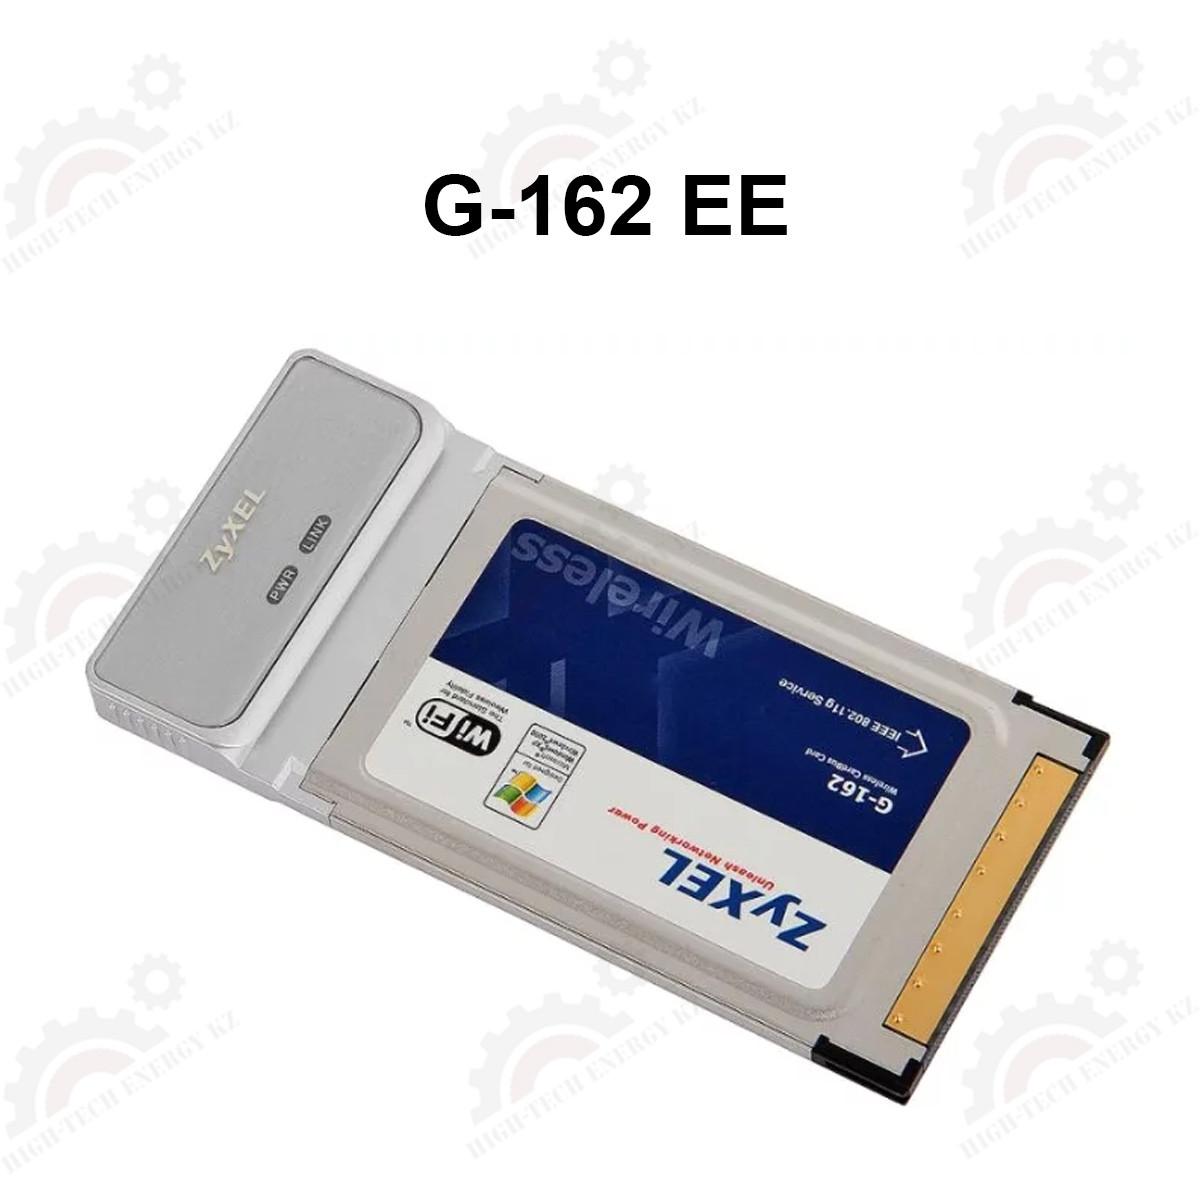 802.11g+ беспроводной PC Card-адаптер, шт